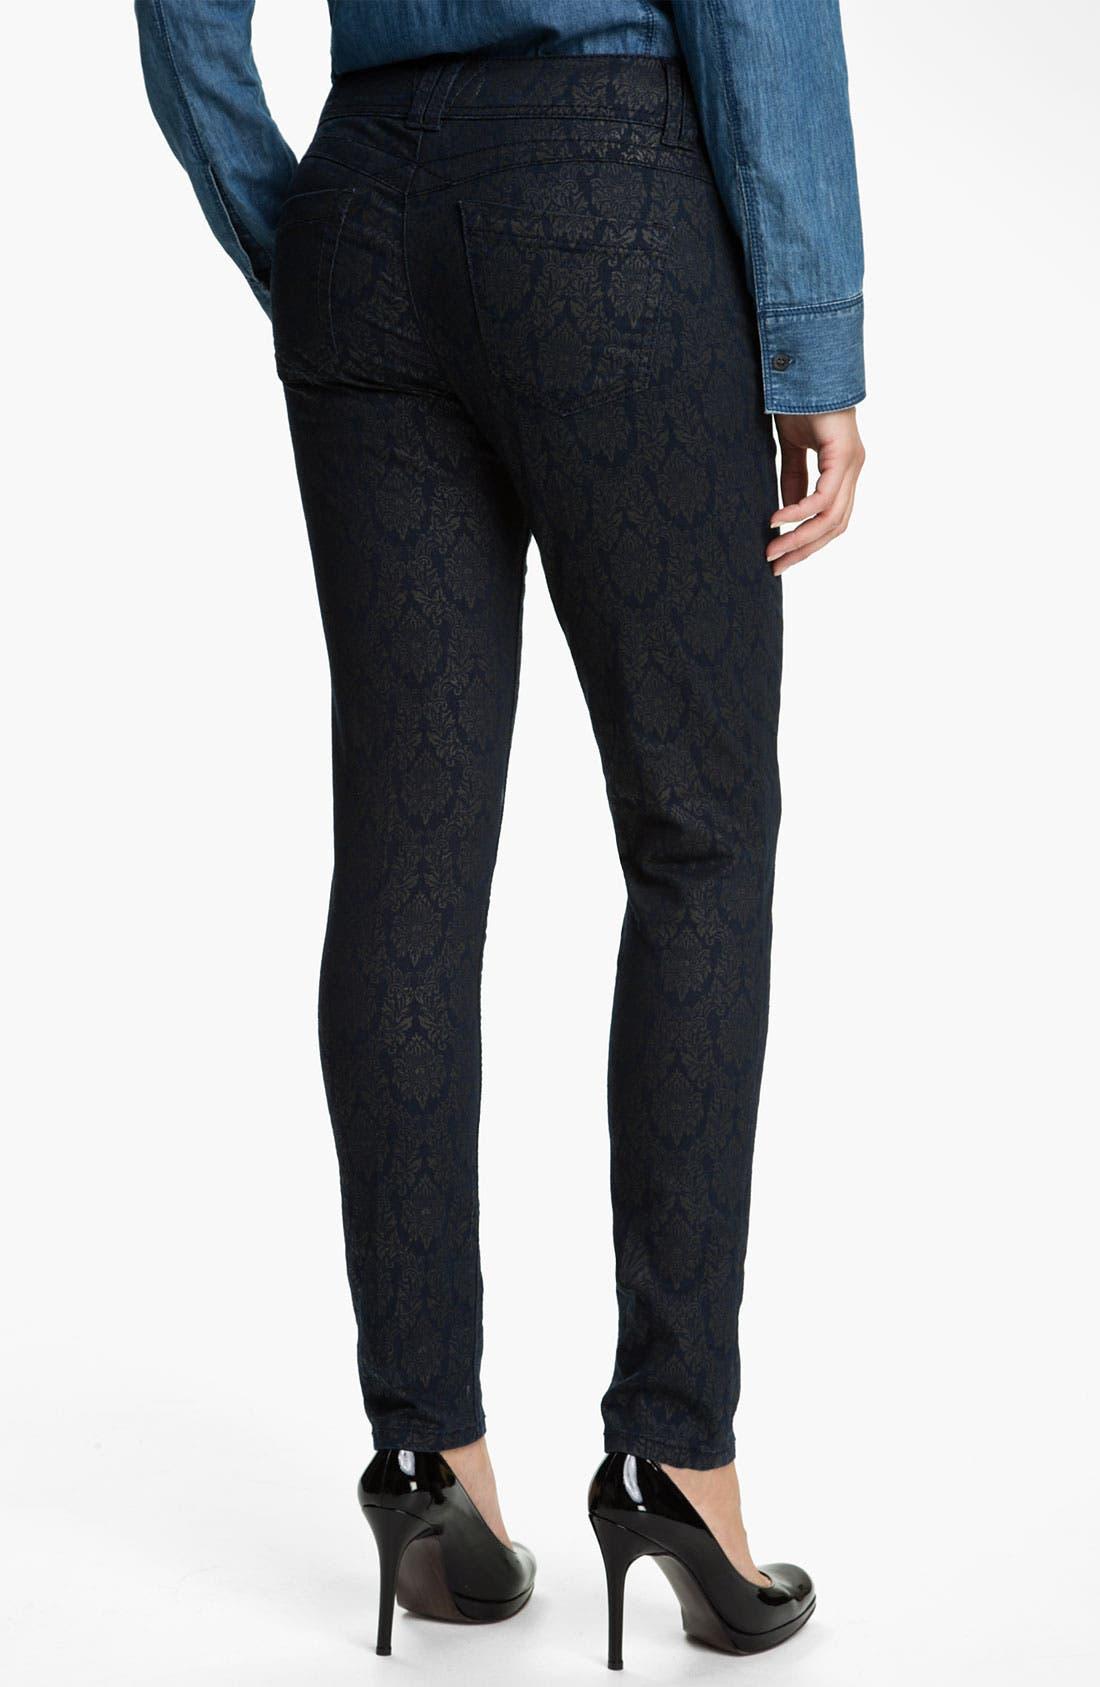 Alternate Image 2  - Wit & Wisdom Brocade Print Skinny Jeans (Indigo) (Nordstrom Exclusive)